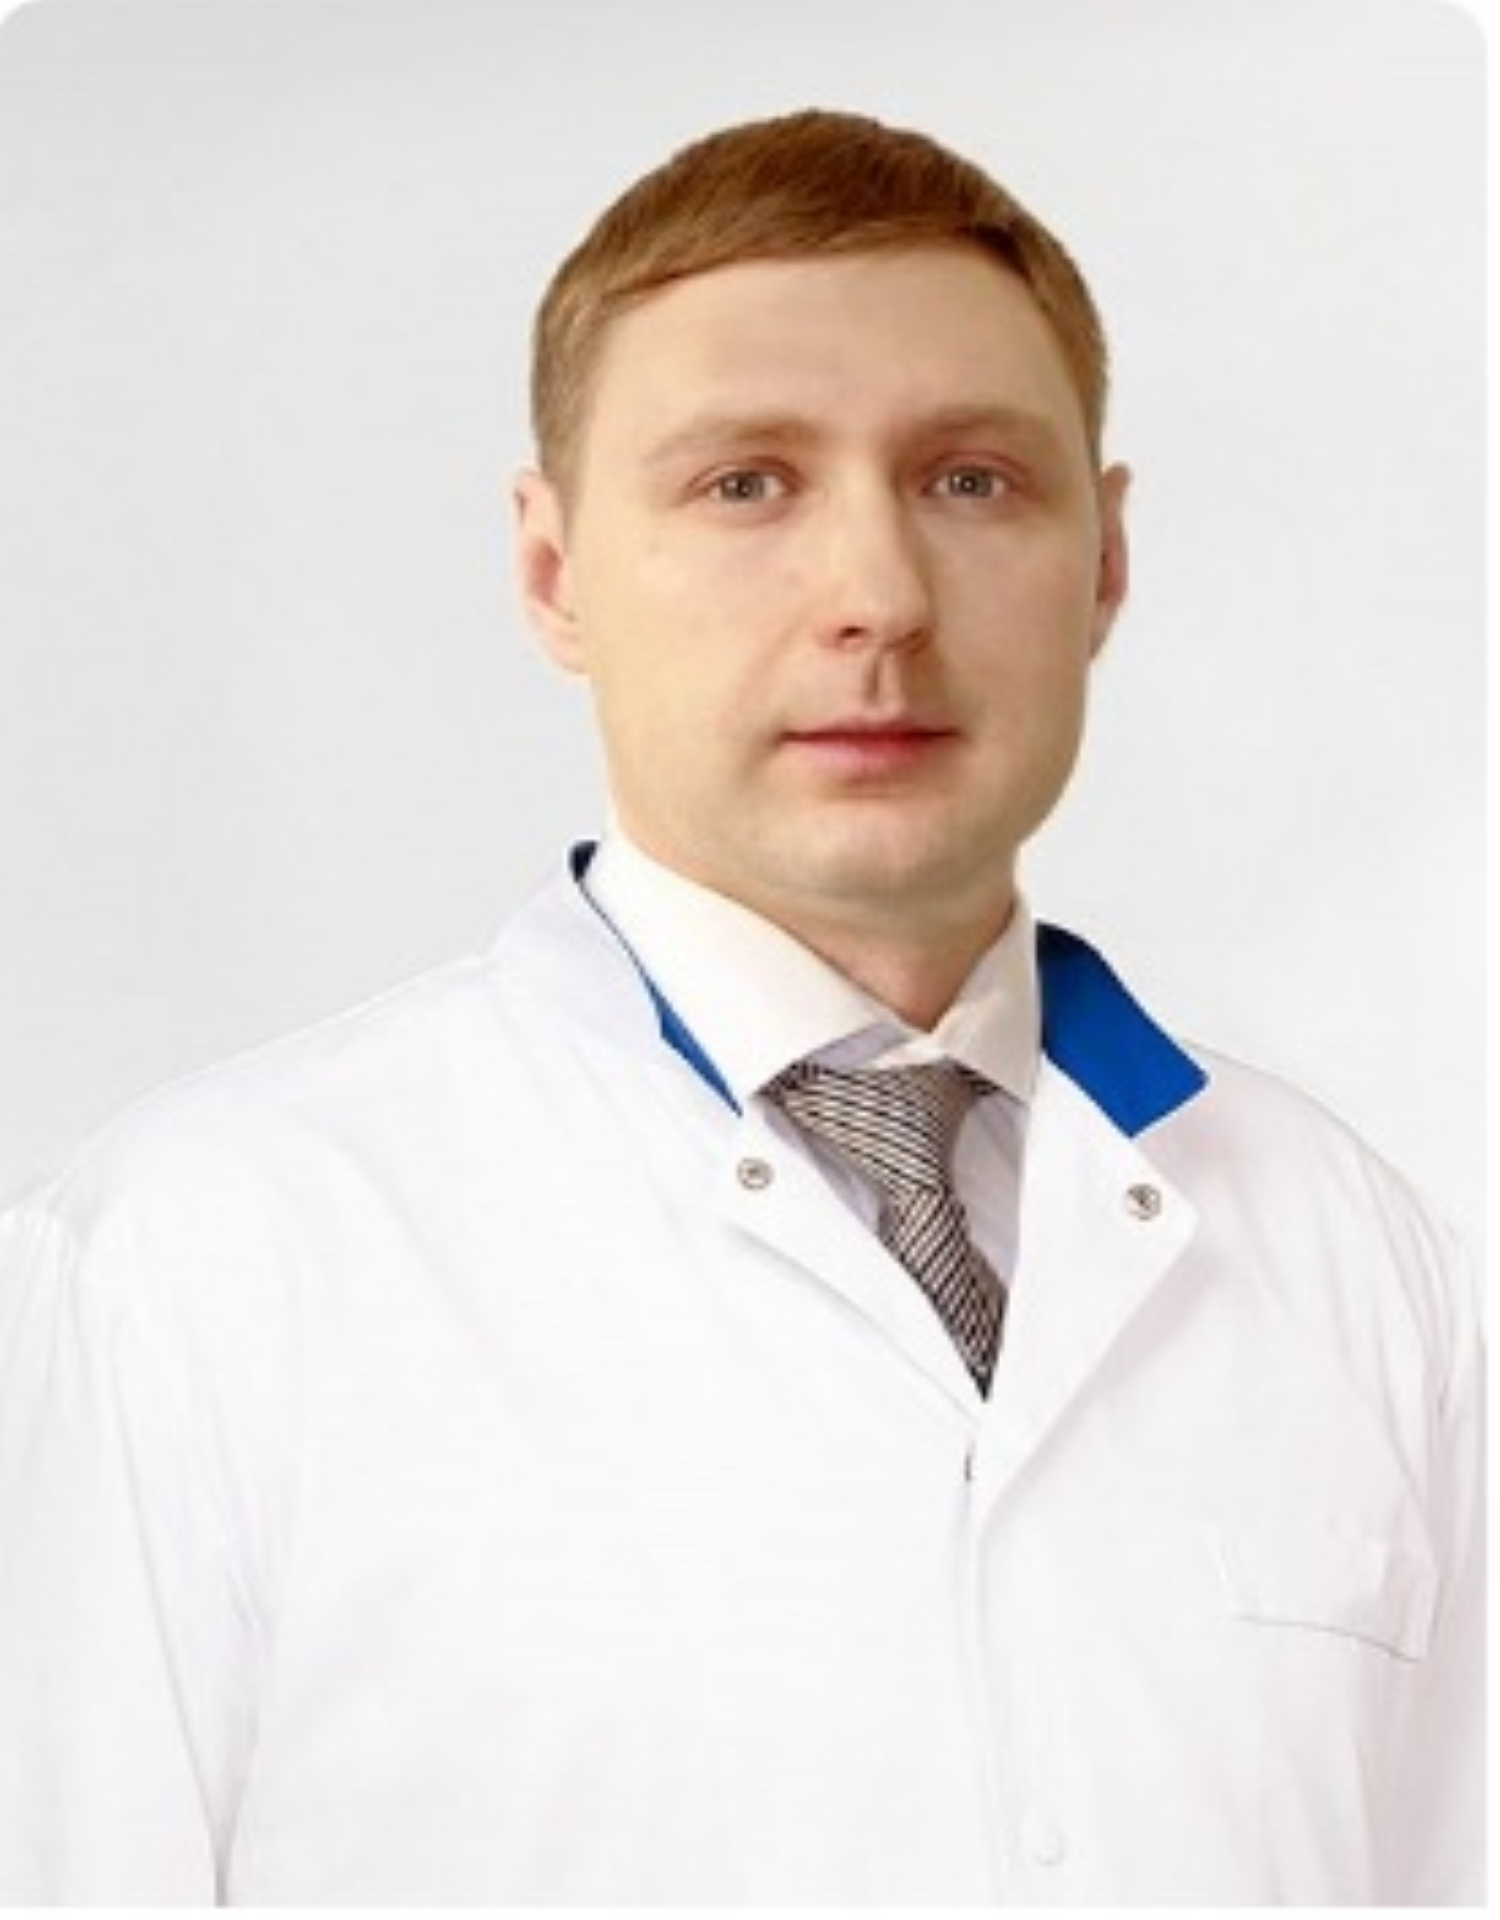 Korneev Kirill Viktorovich